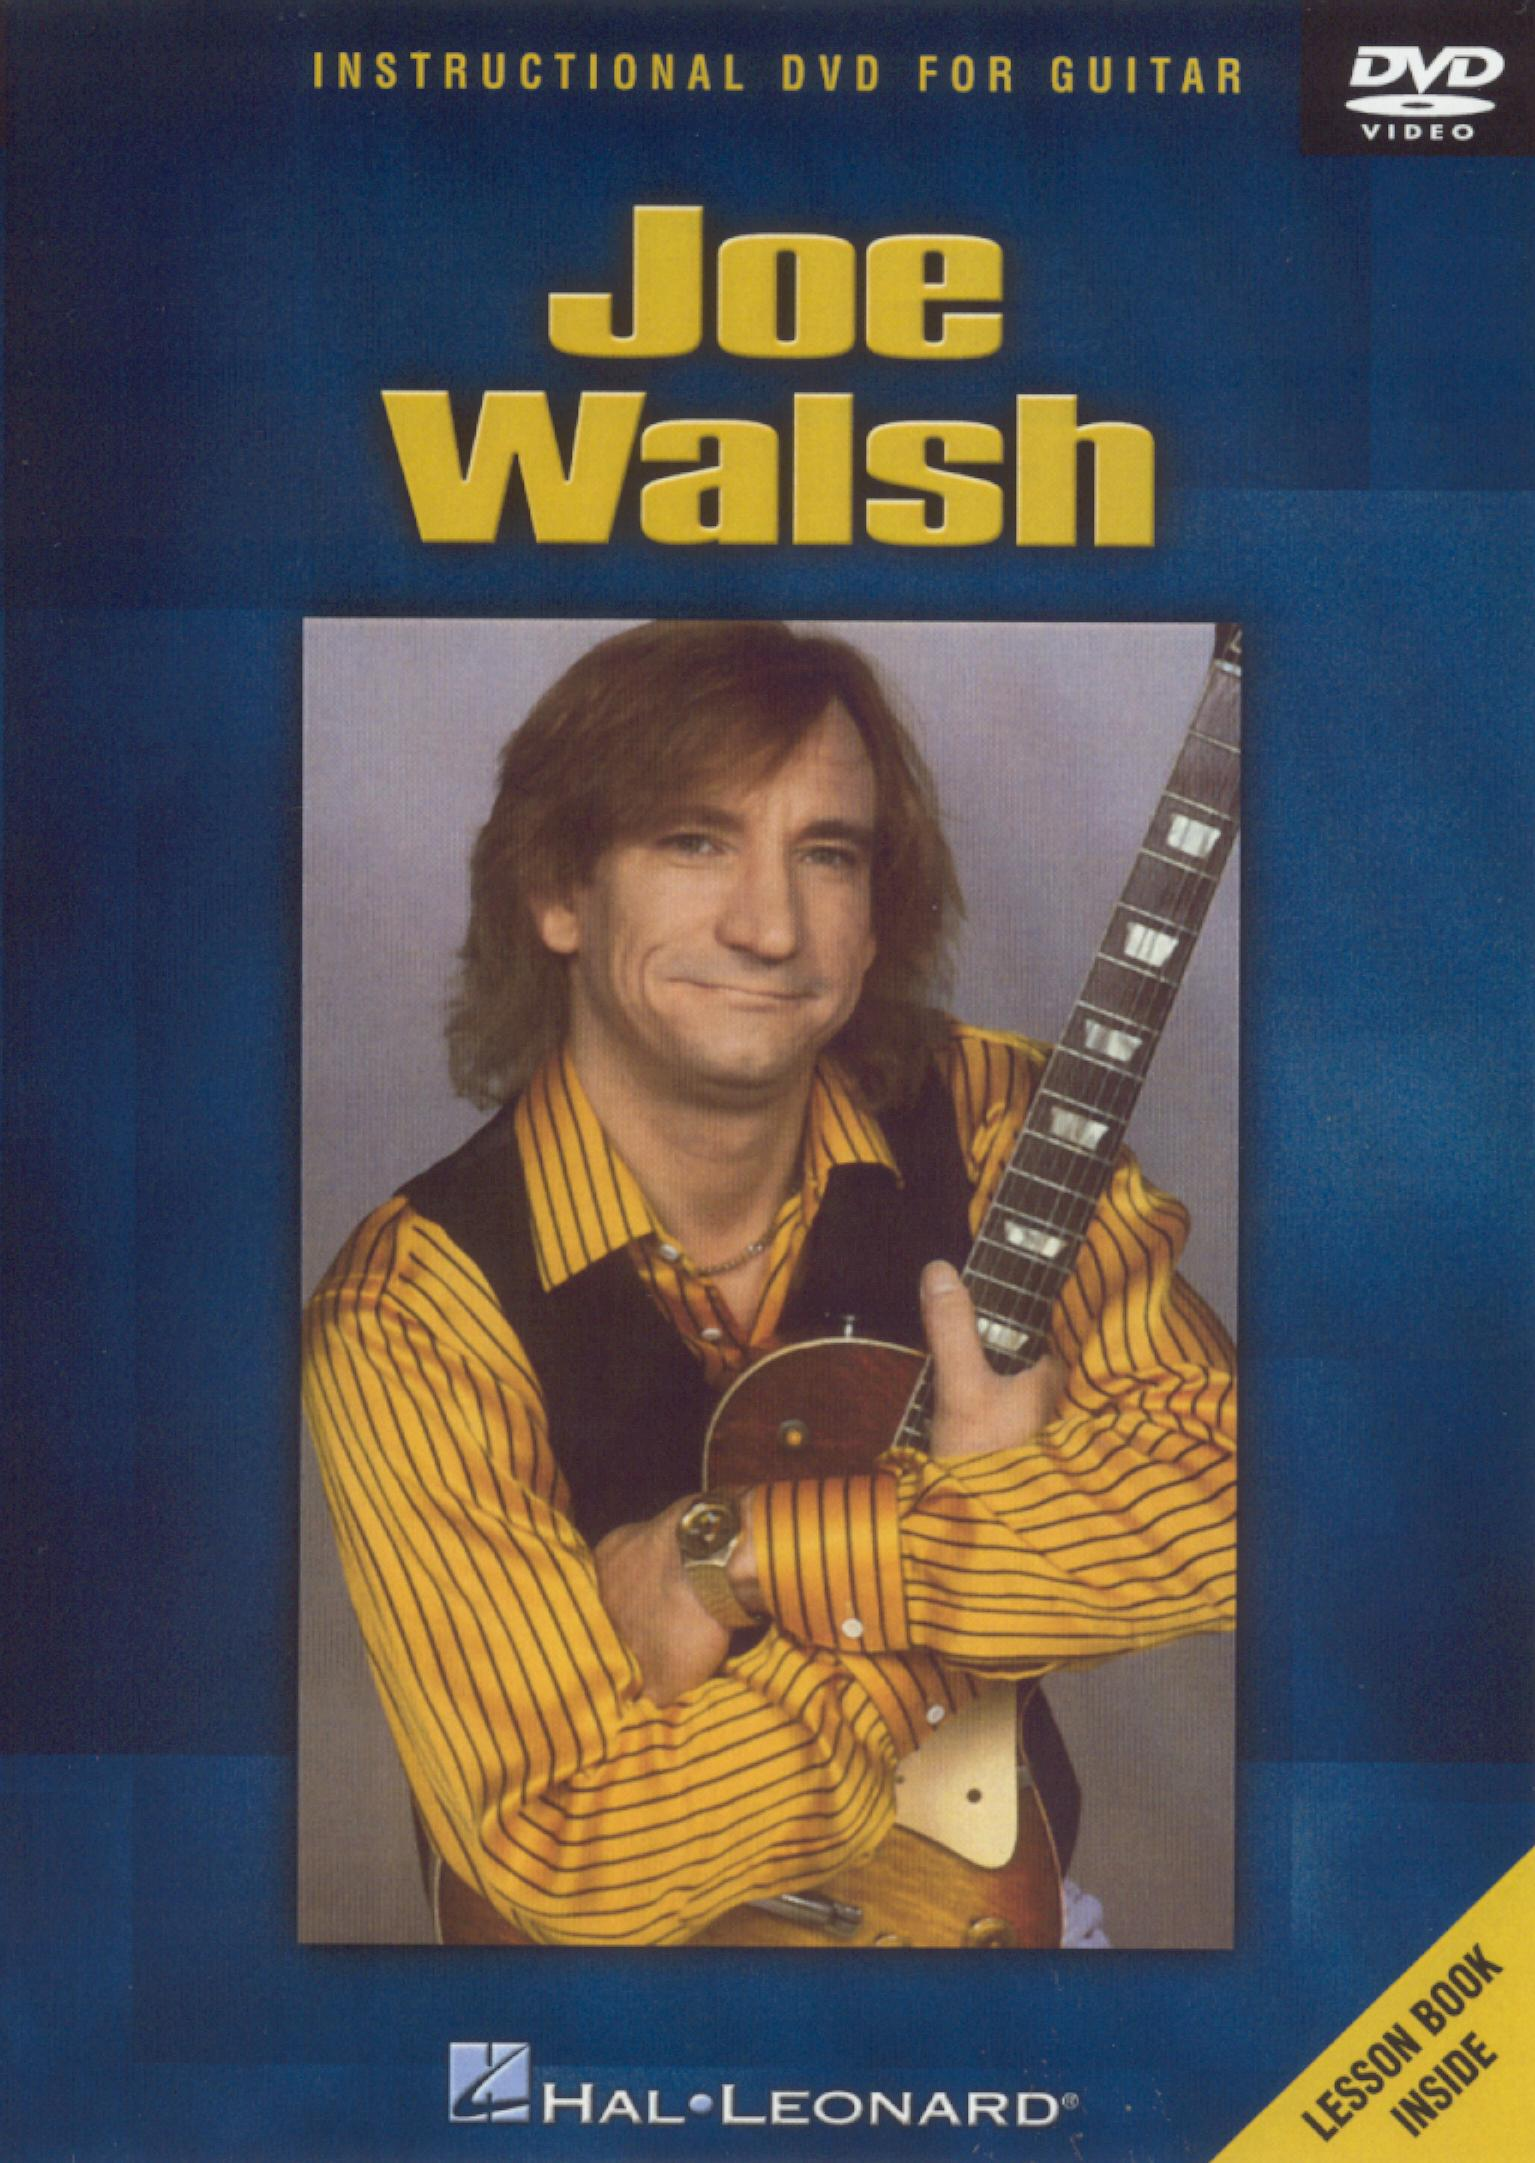 Joe Walsh: Instructional DVD for Guitar